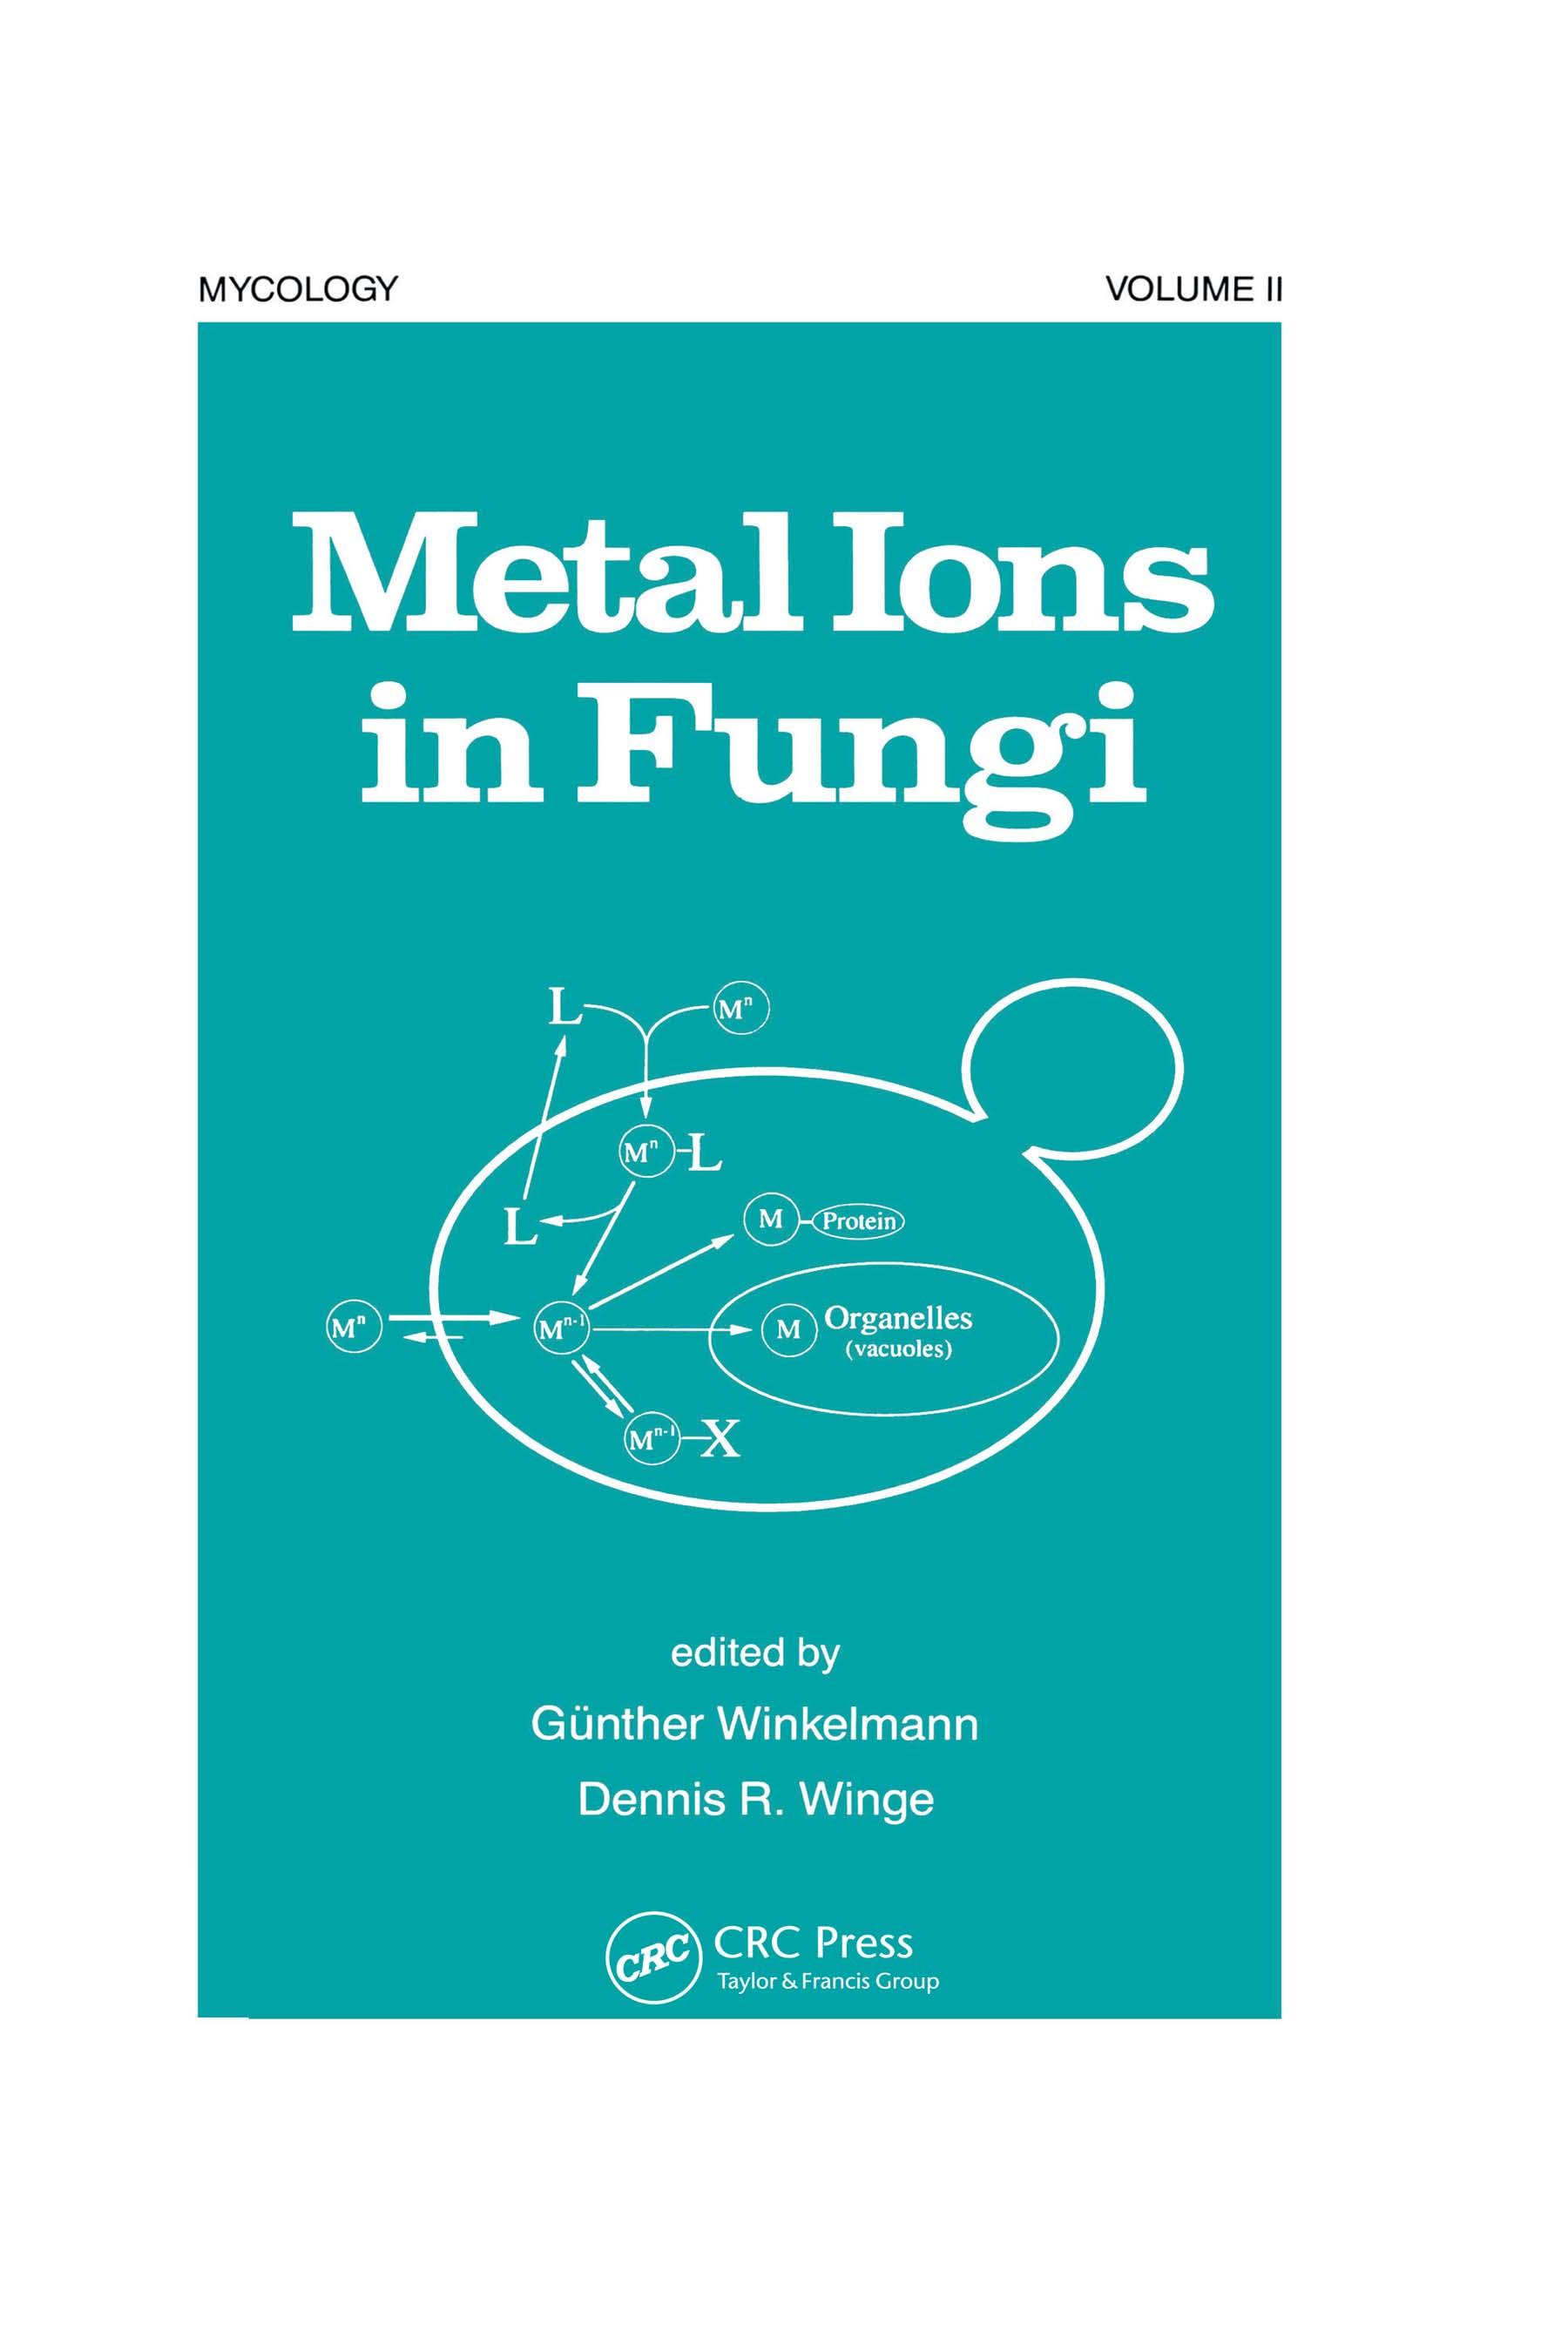 Evolution and Biological Roles of Fungal Superoxide Dismutases